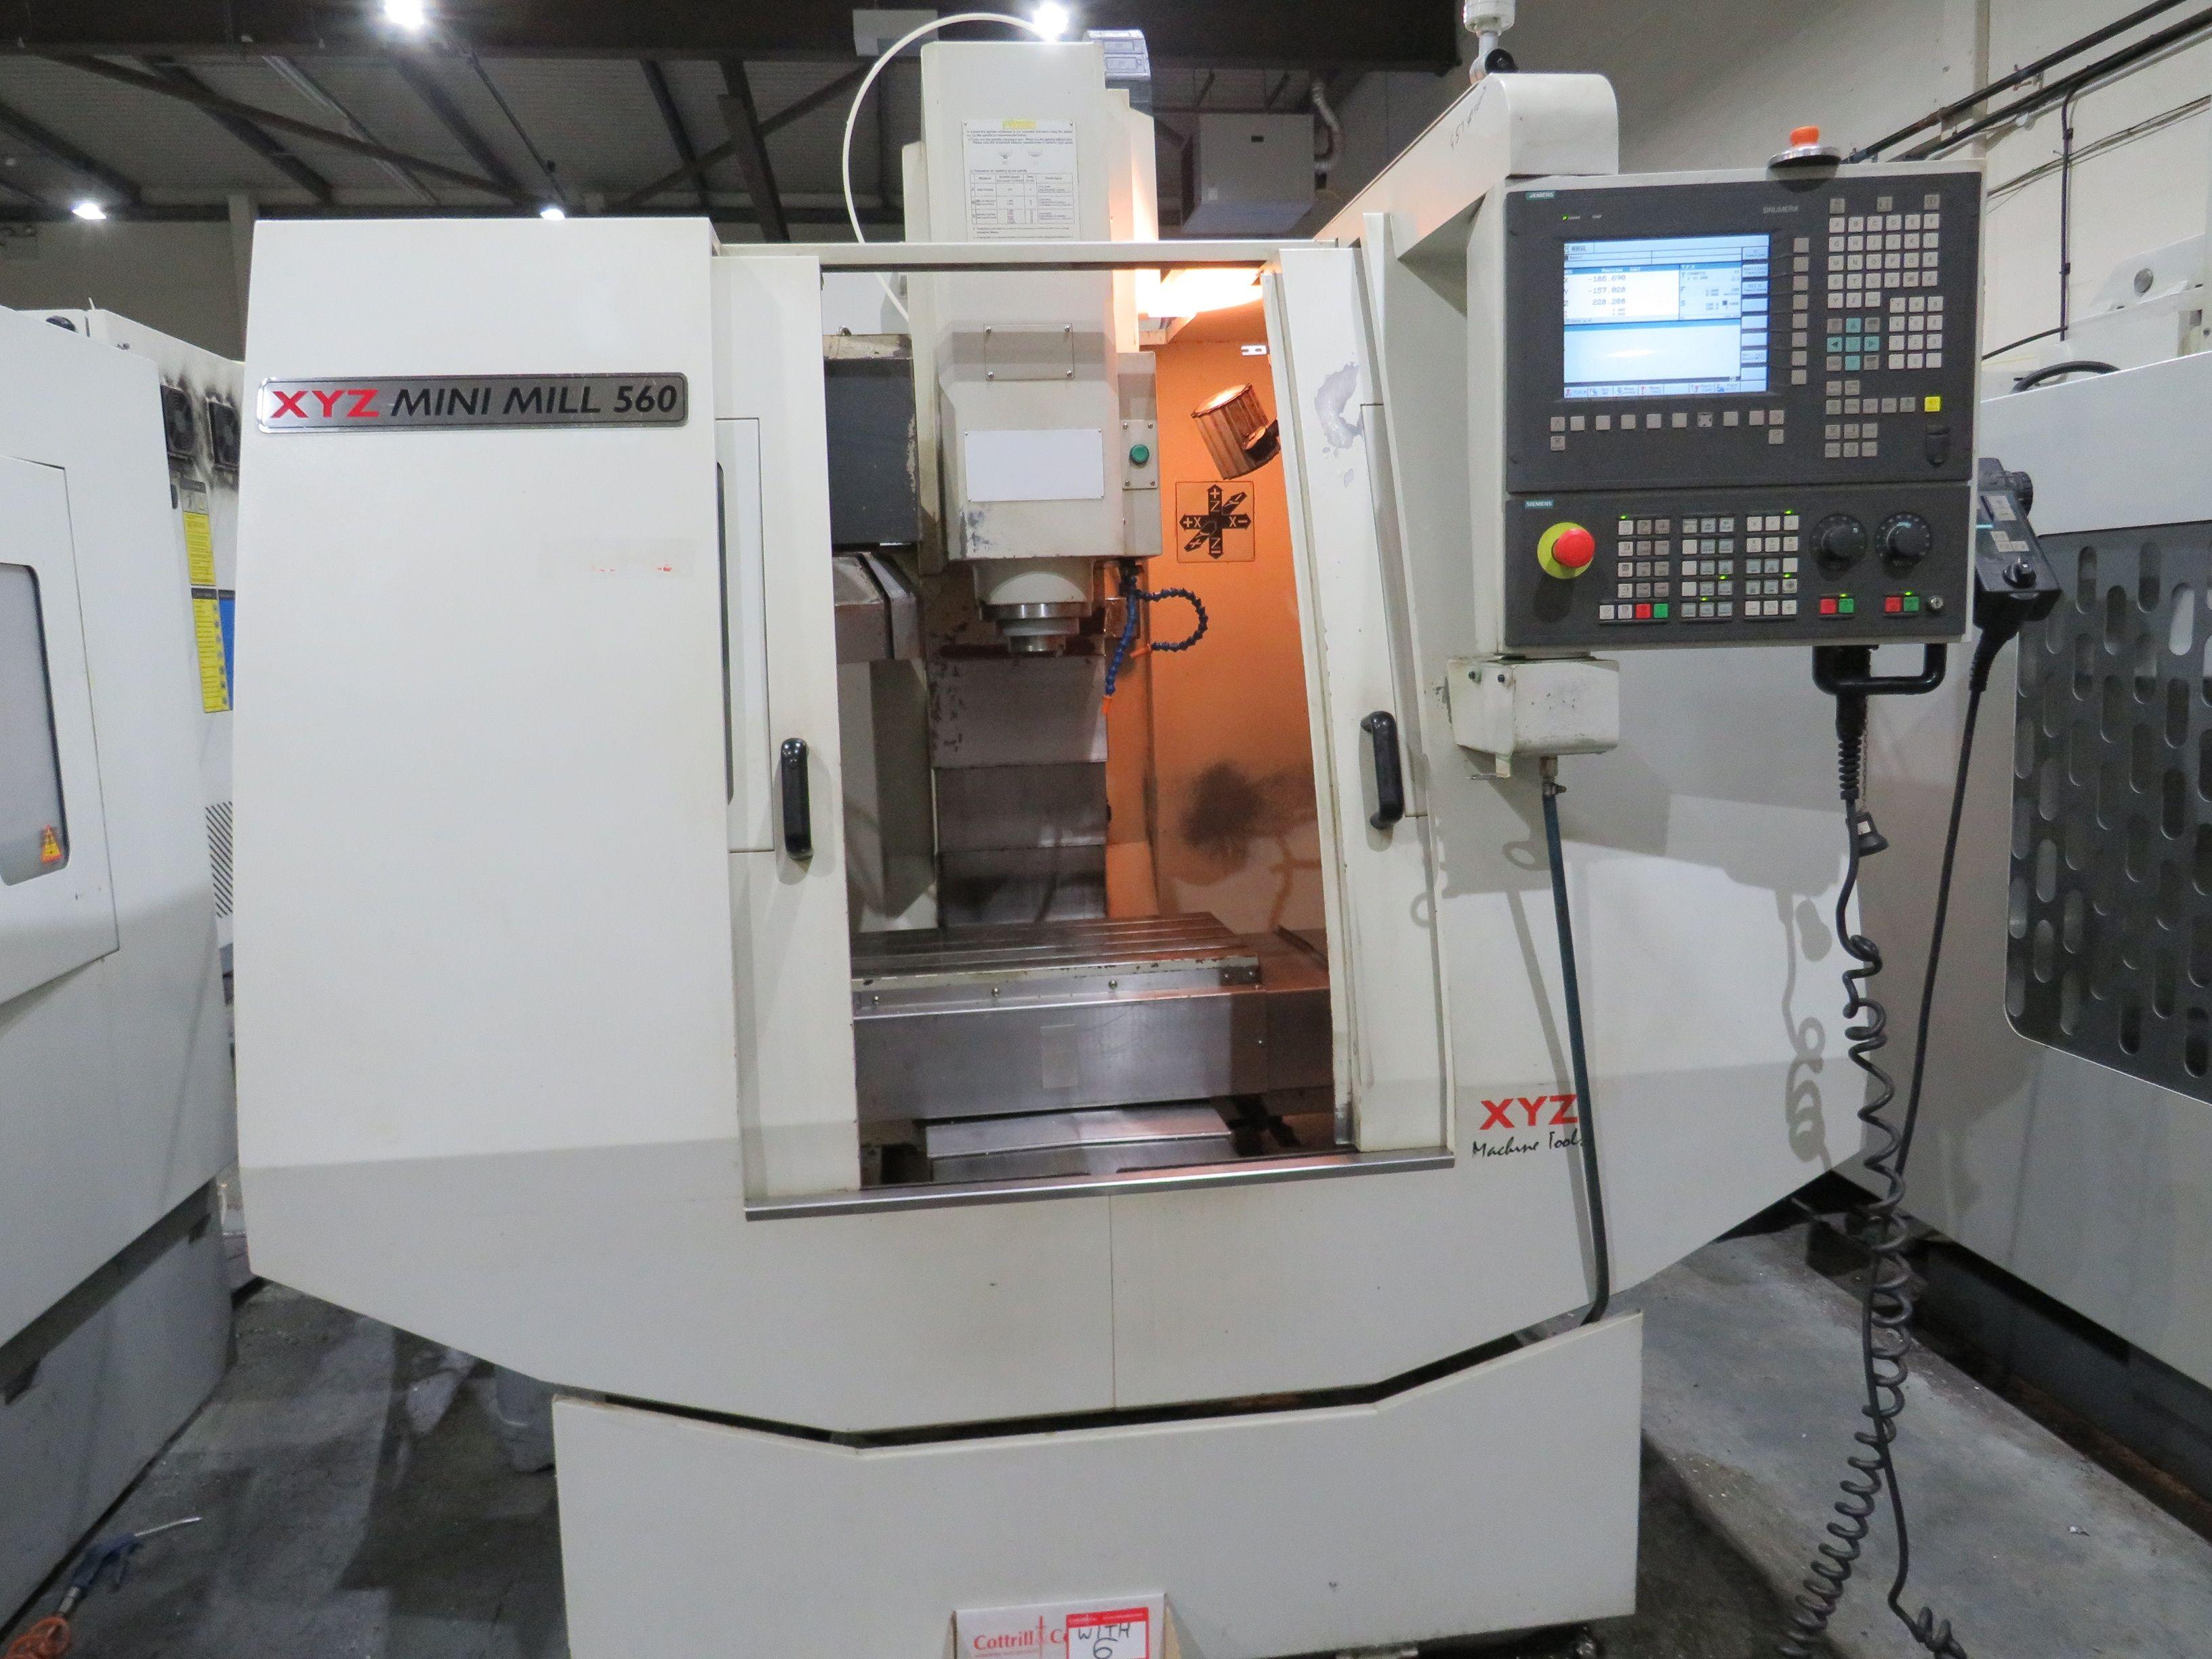 Vertikal-Bearbeitungszentrum XYZ 560